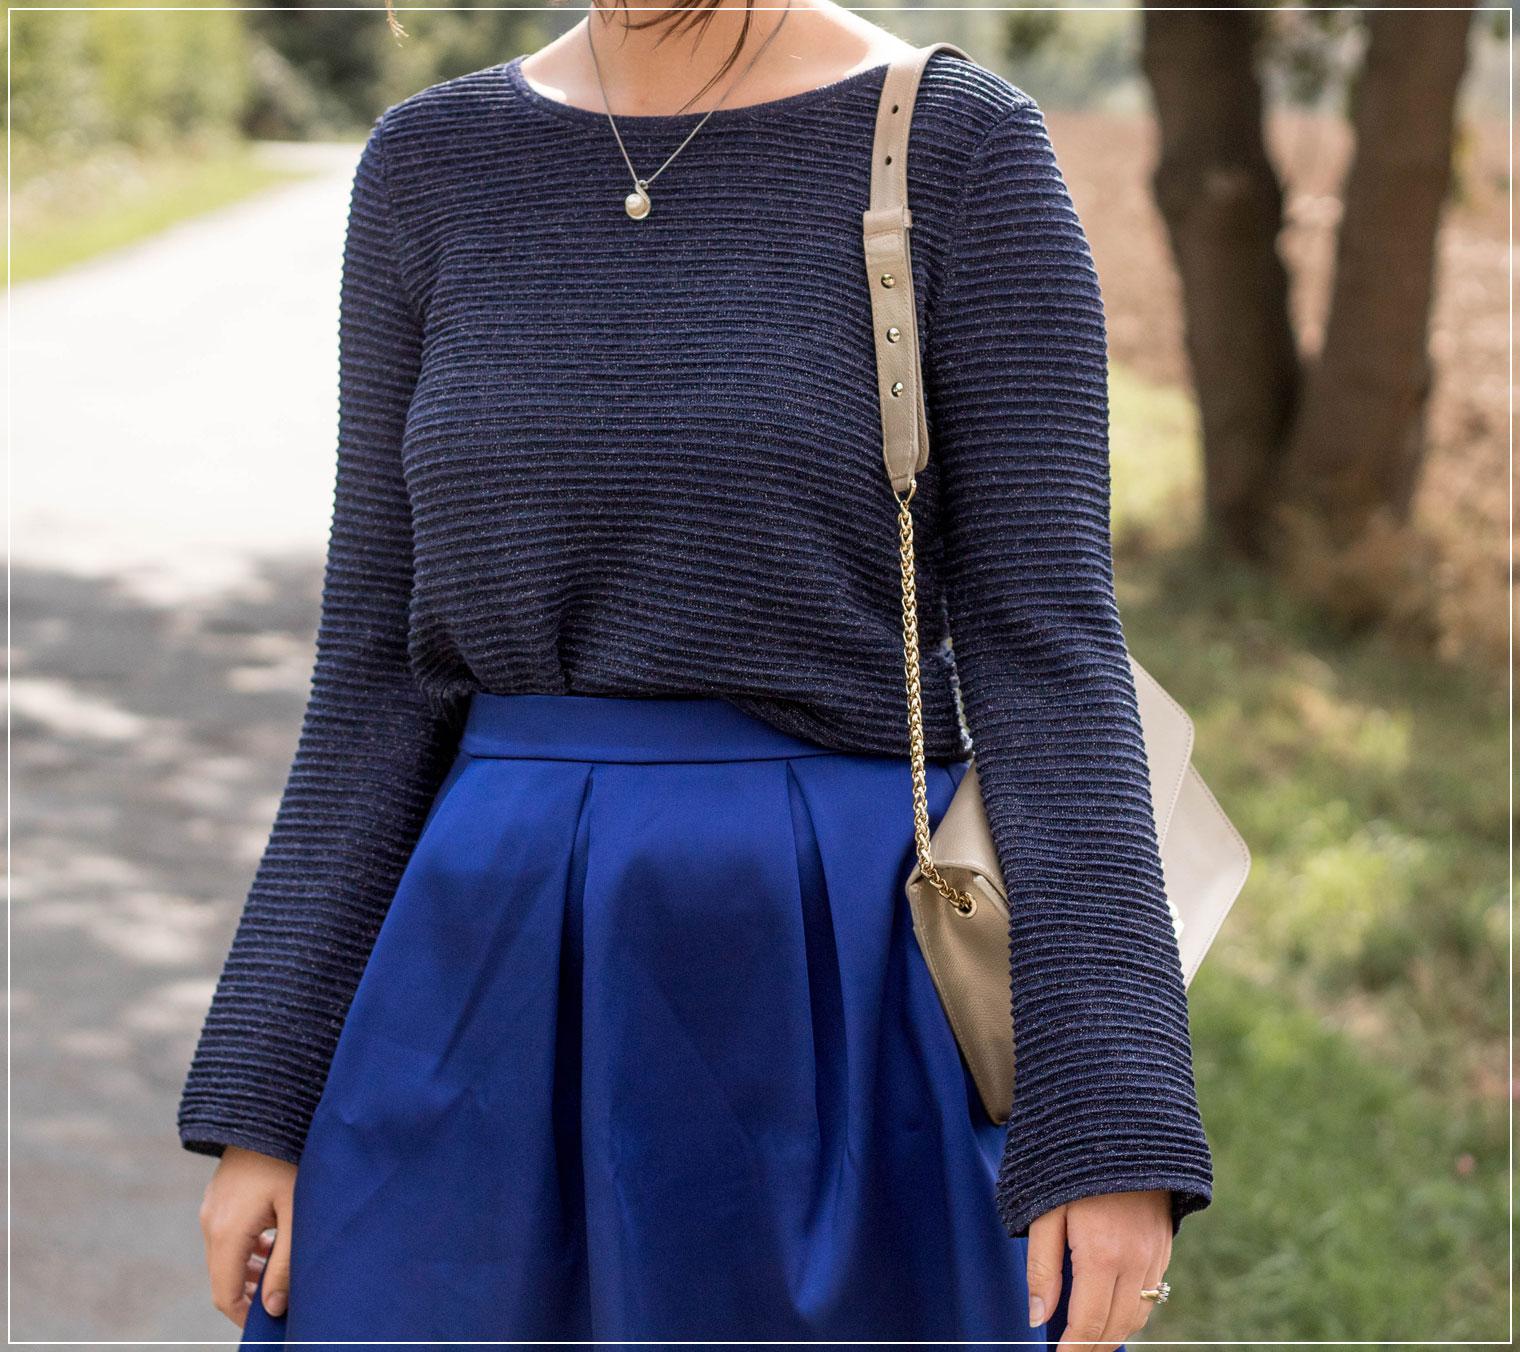 Royal Blau, Königsblau, Trendfarbe, Modetrend, eleganter Style, Herbstoutfit, Herbstlook, Outfitinspiration, Autumnstyle, Abendoutfit, Modebloggerin, Fashionbloggerin, Modeblog, Ruhrgebiet